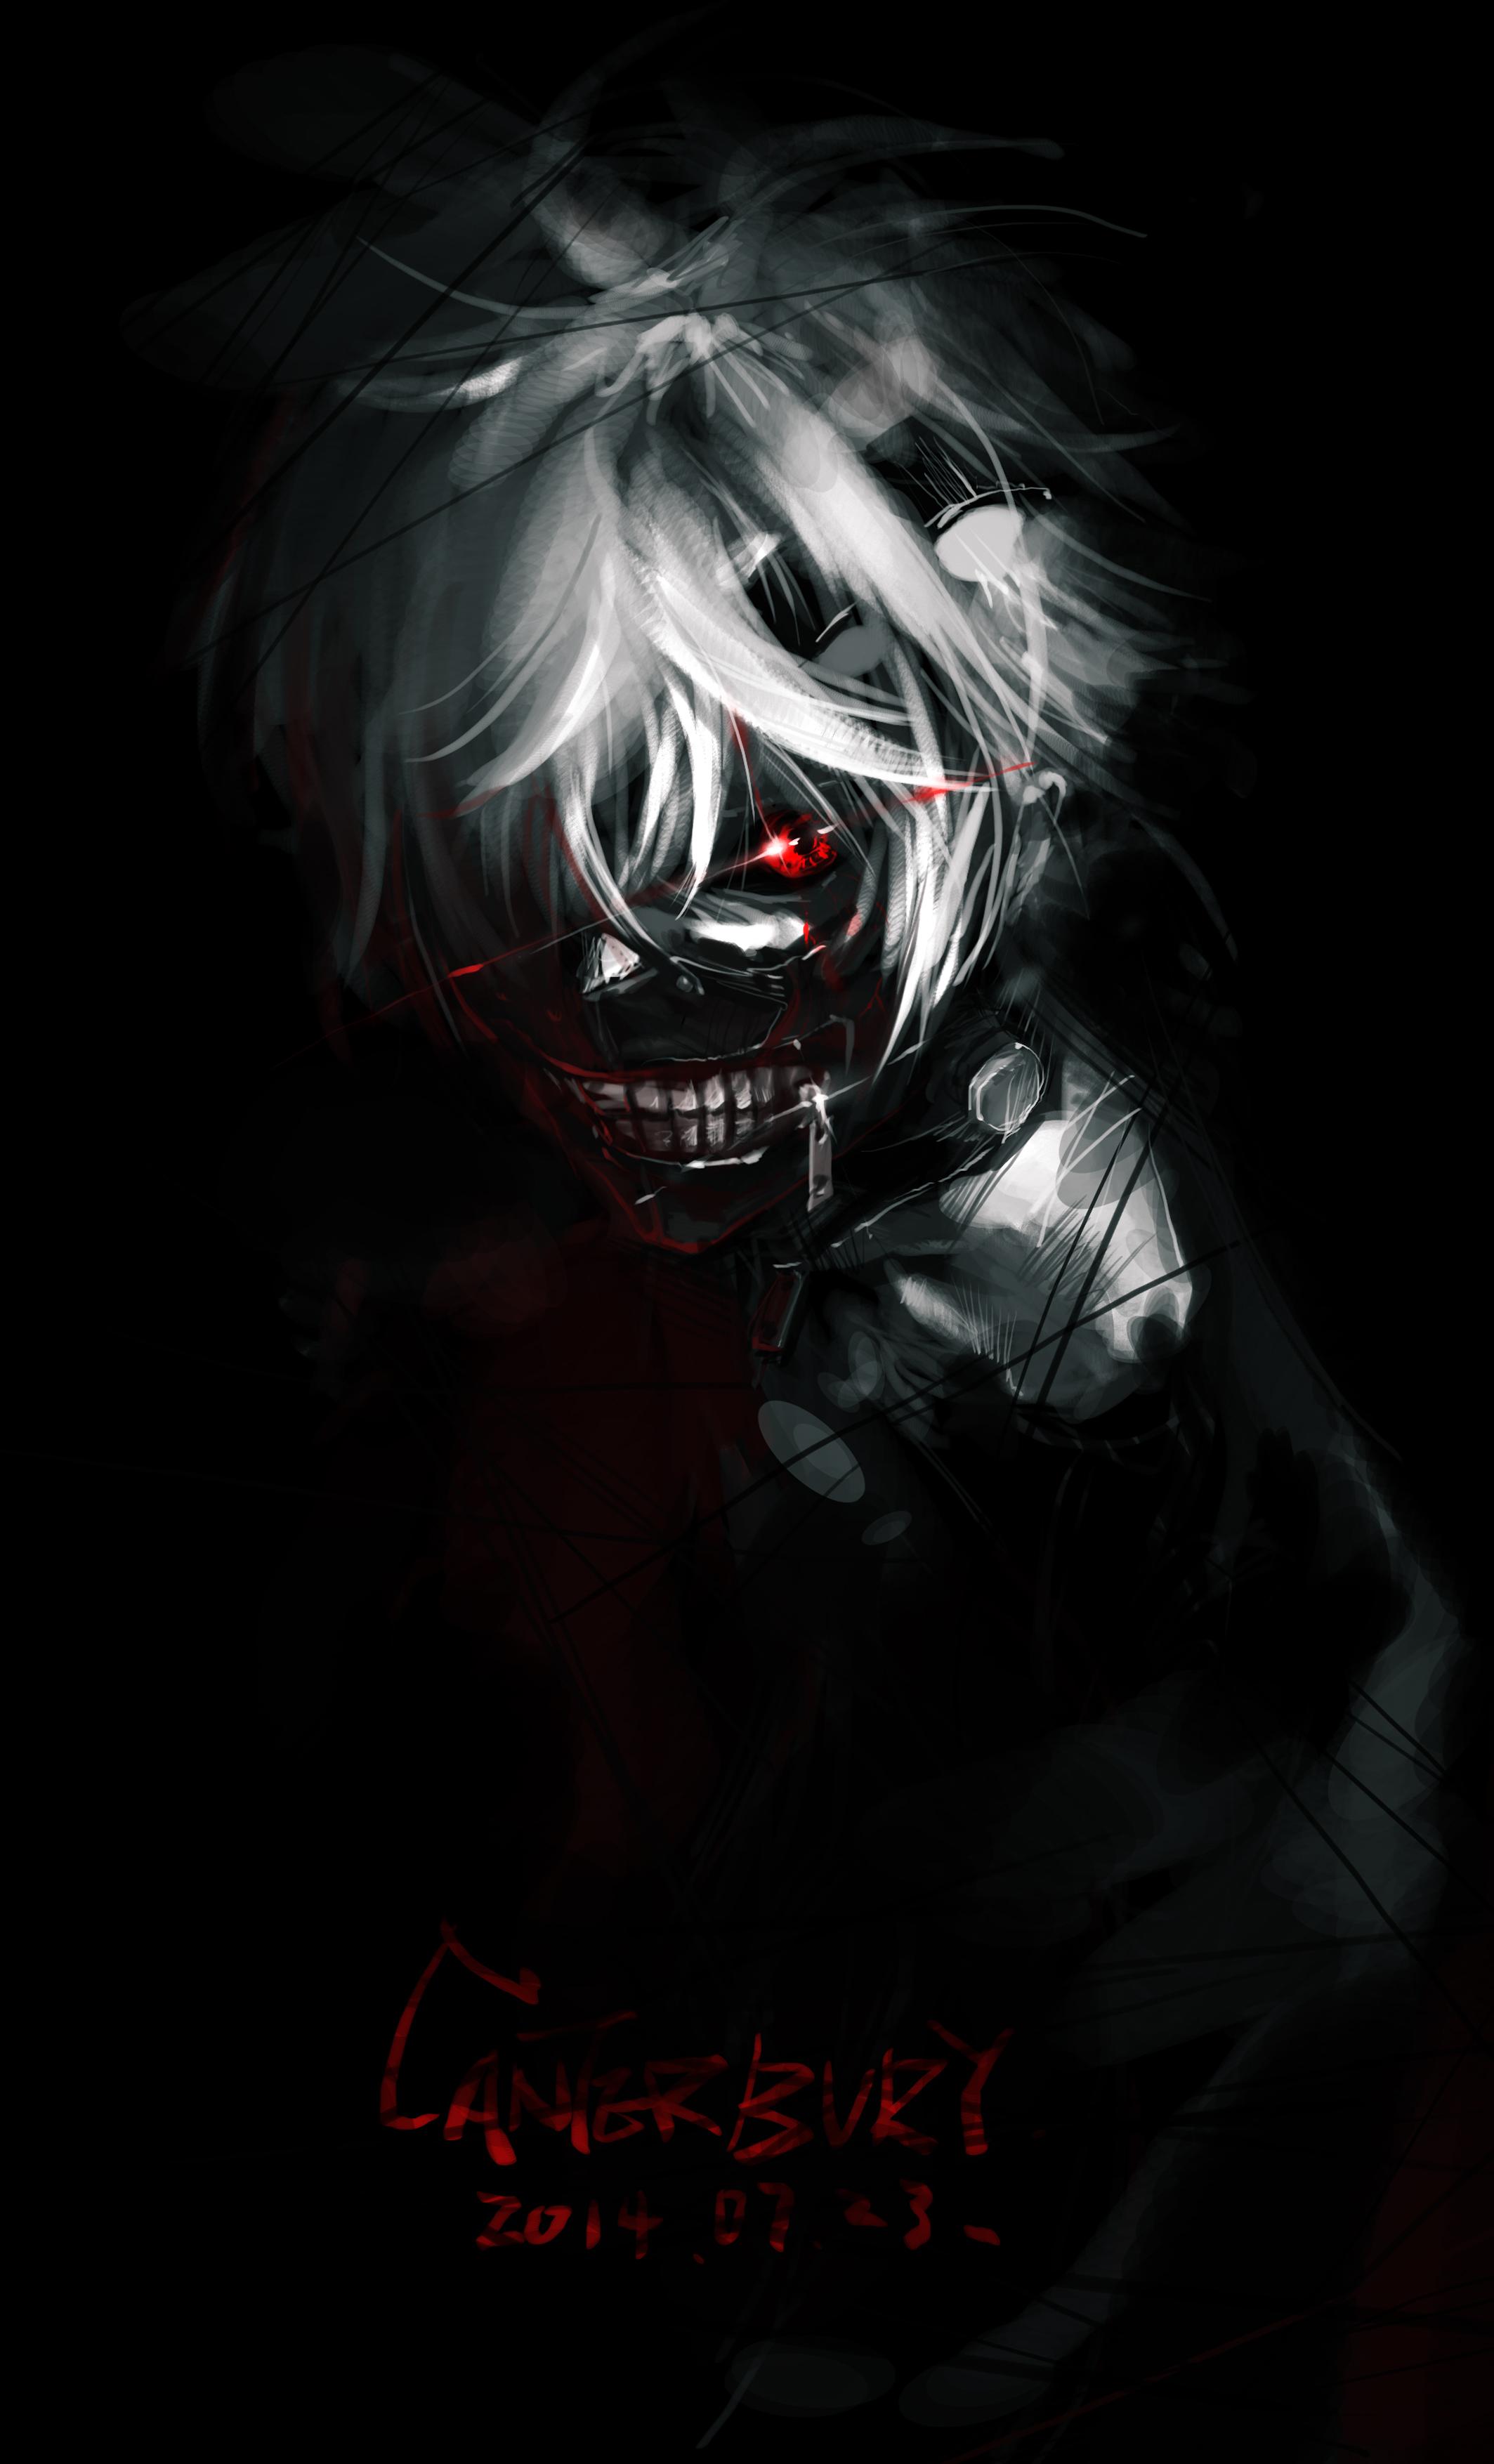 wallpaper portrait display tokyo ghoul kaneki ken dark anime